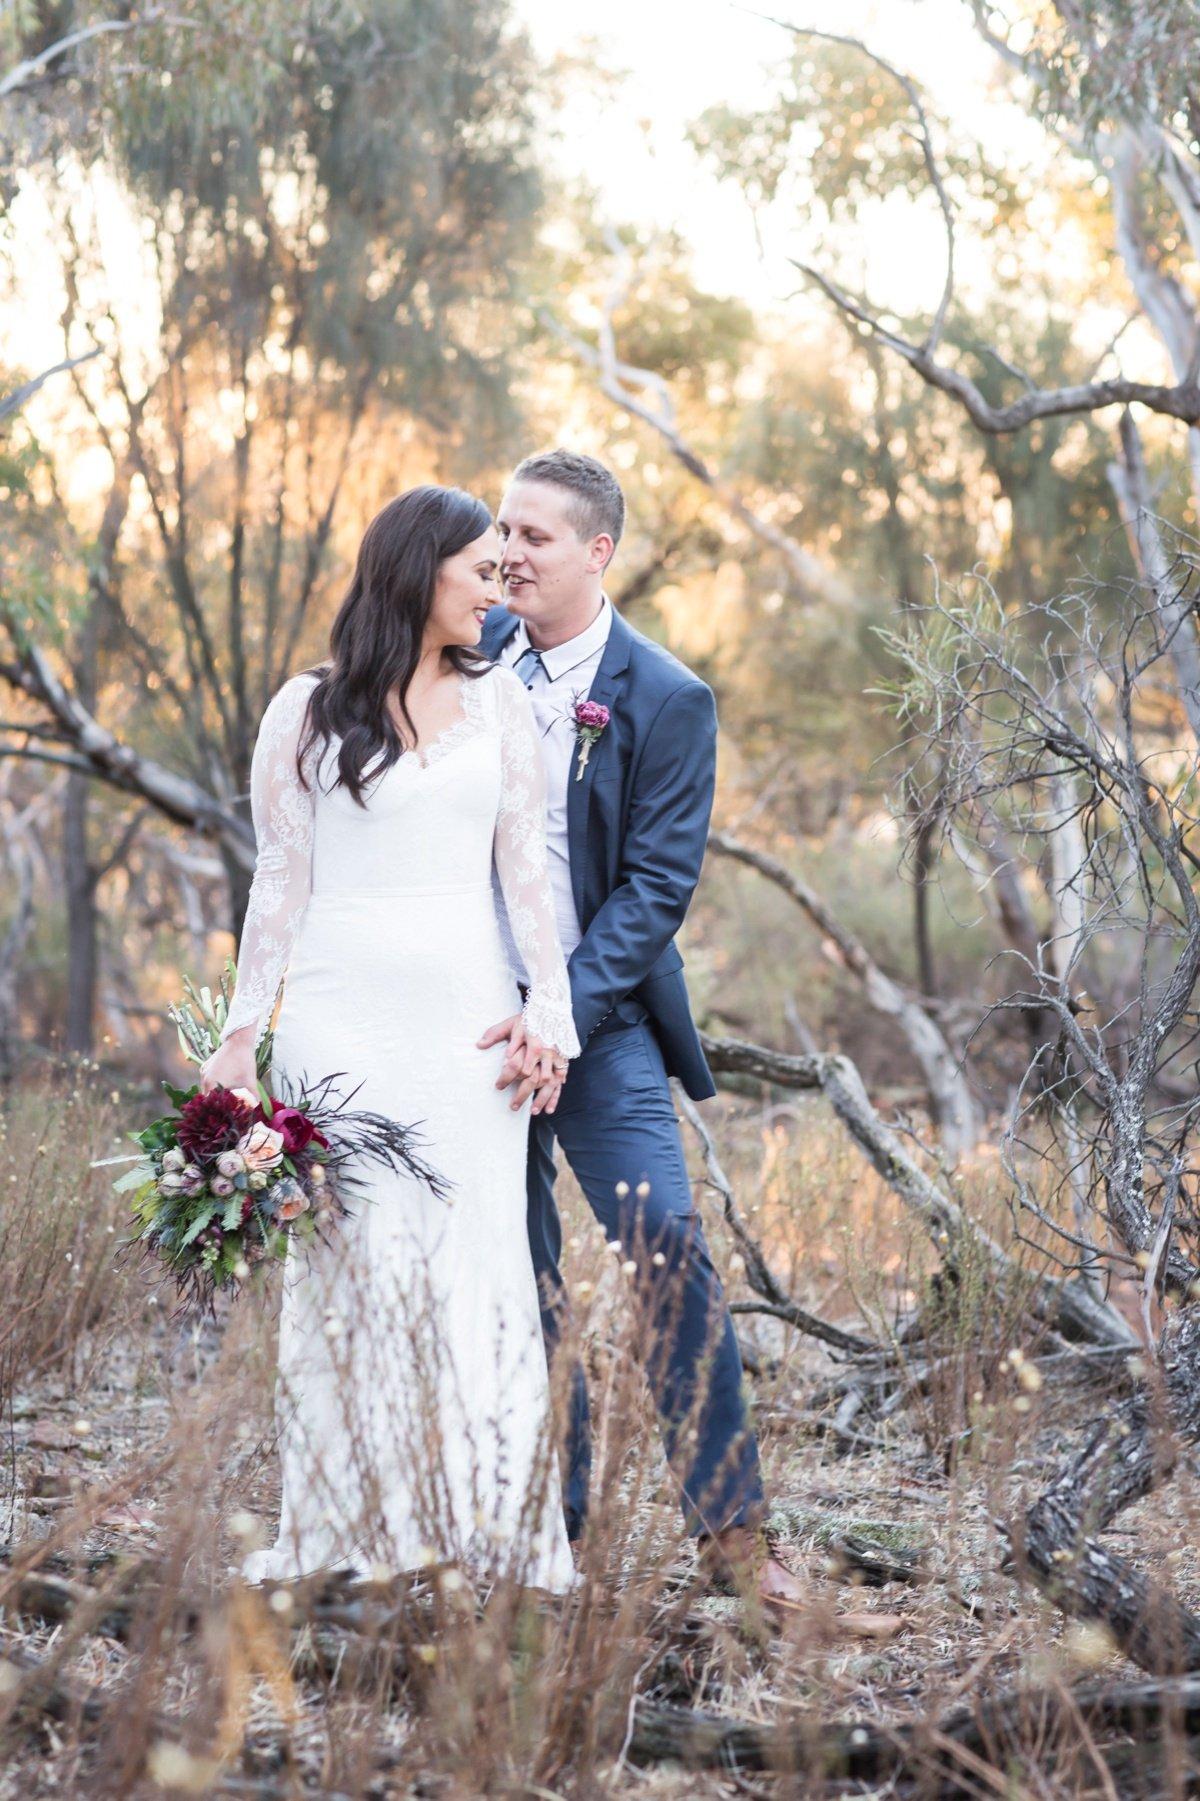 tabletop mountain peregrines wedding albury wagga wagga_wedding photographer albury griffith melbourne rutherglen wedding photographer_0278